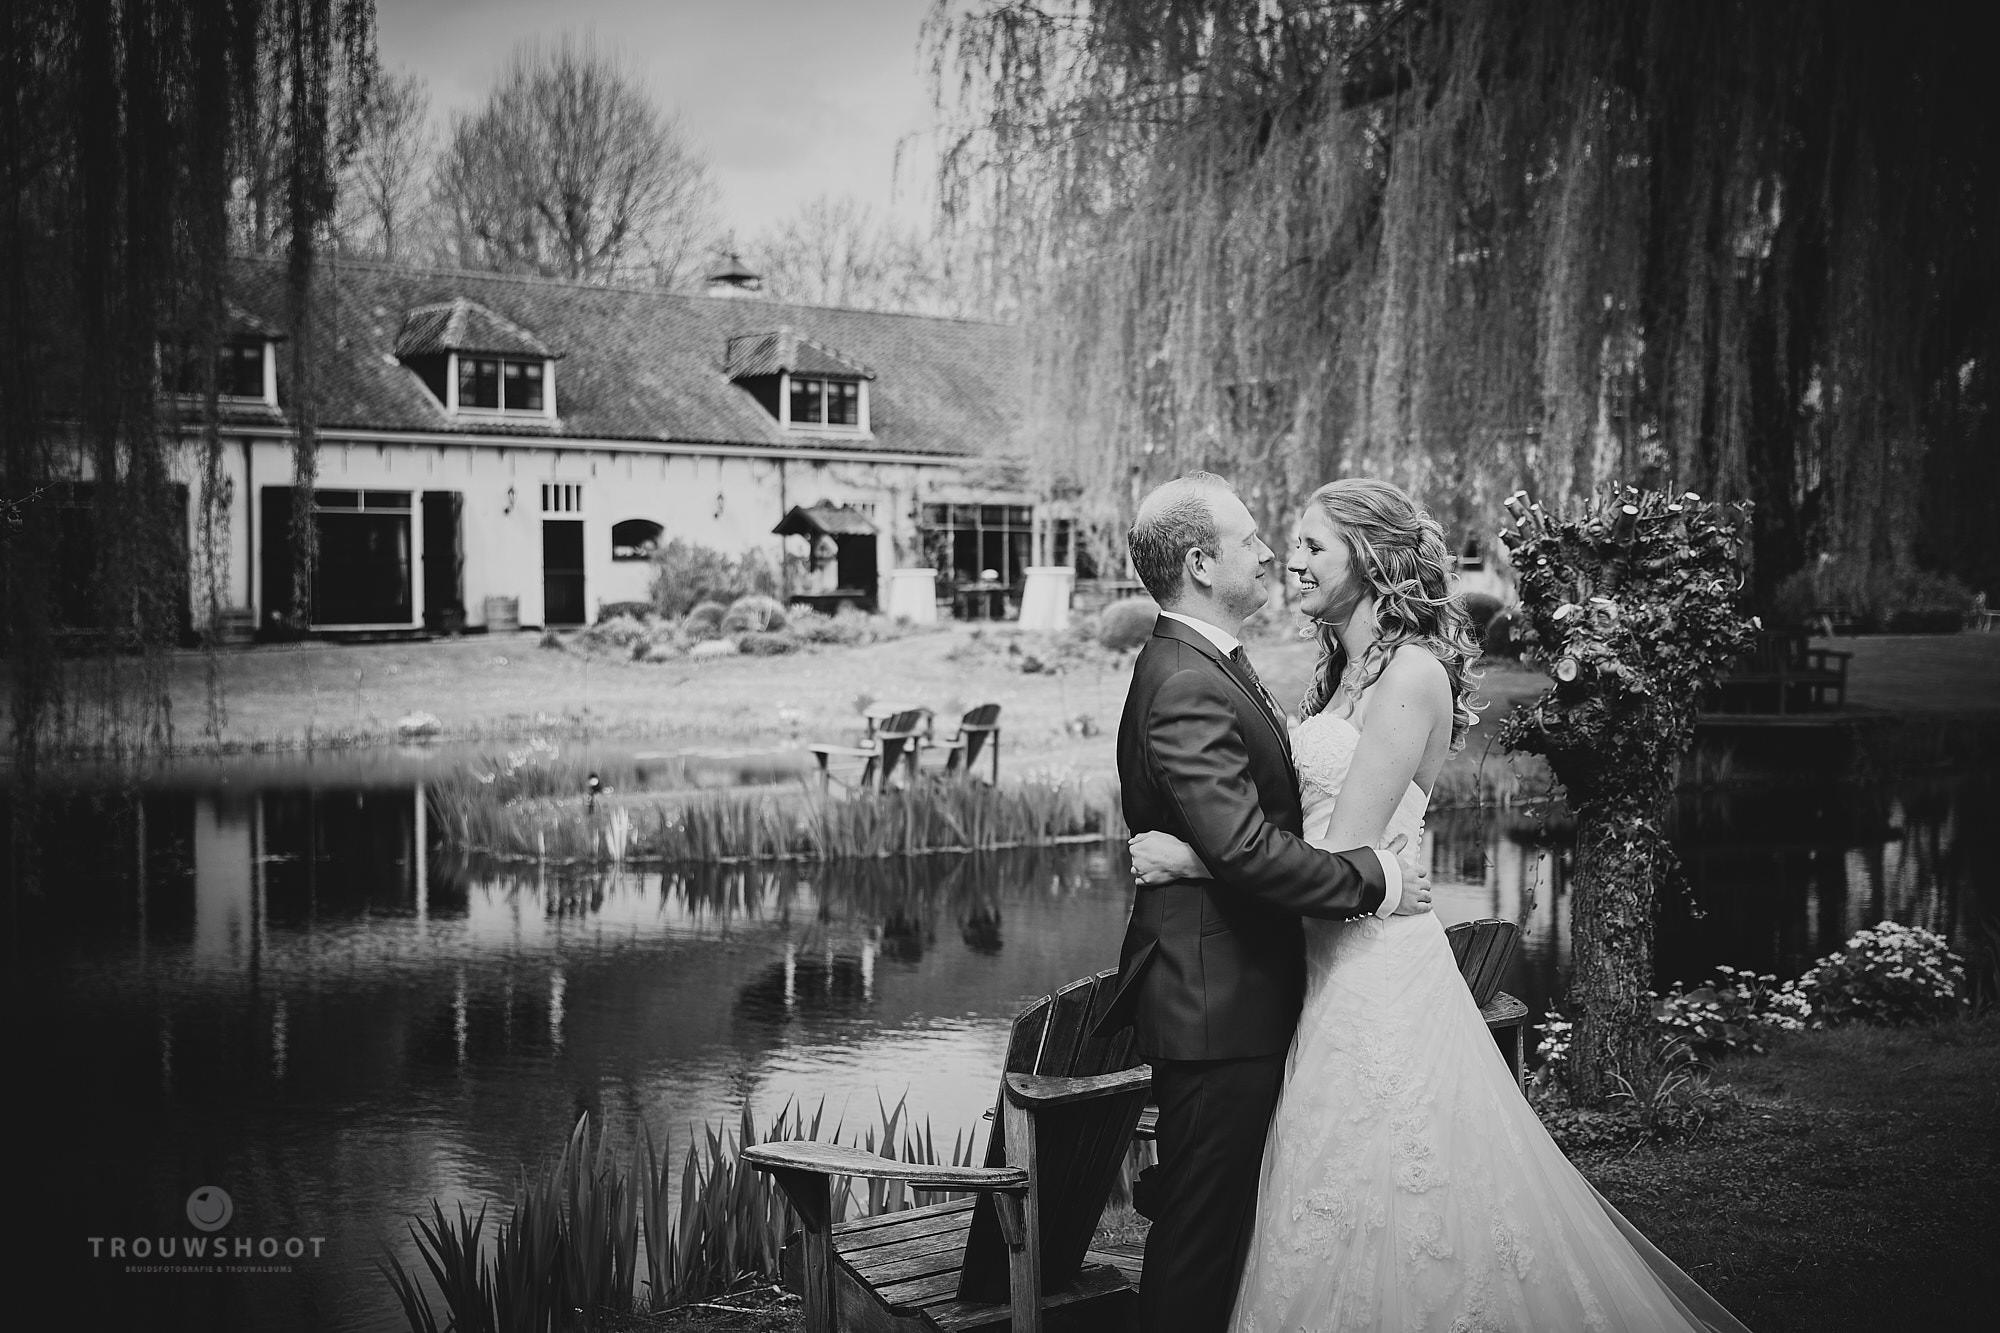 trouwshoot_bruidsfotografie_trouwfoto_282.jpg